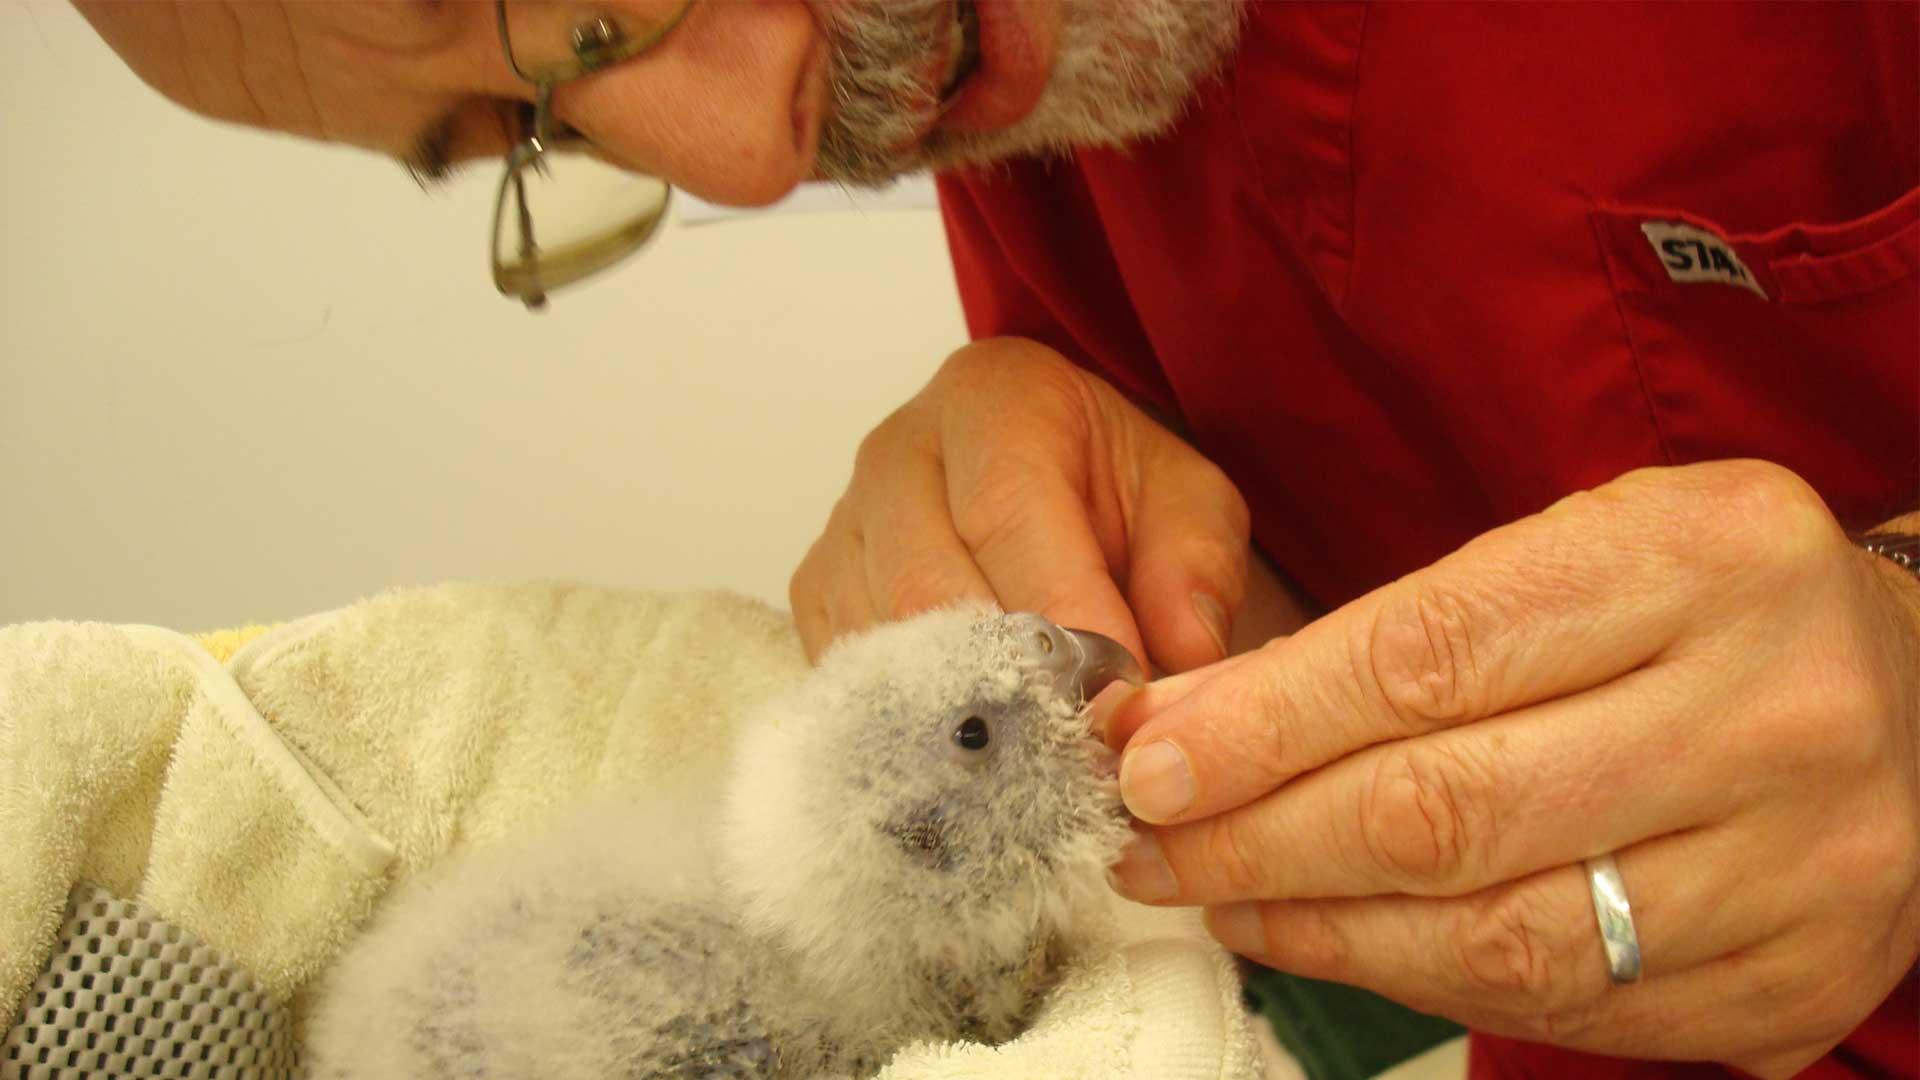 https://rfacdn.nz/zoo/assets/media/richard-kakapo-gallery-2.jpg